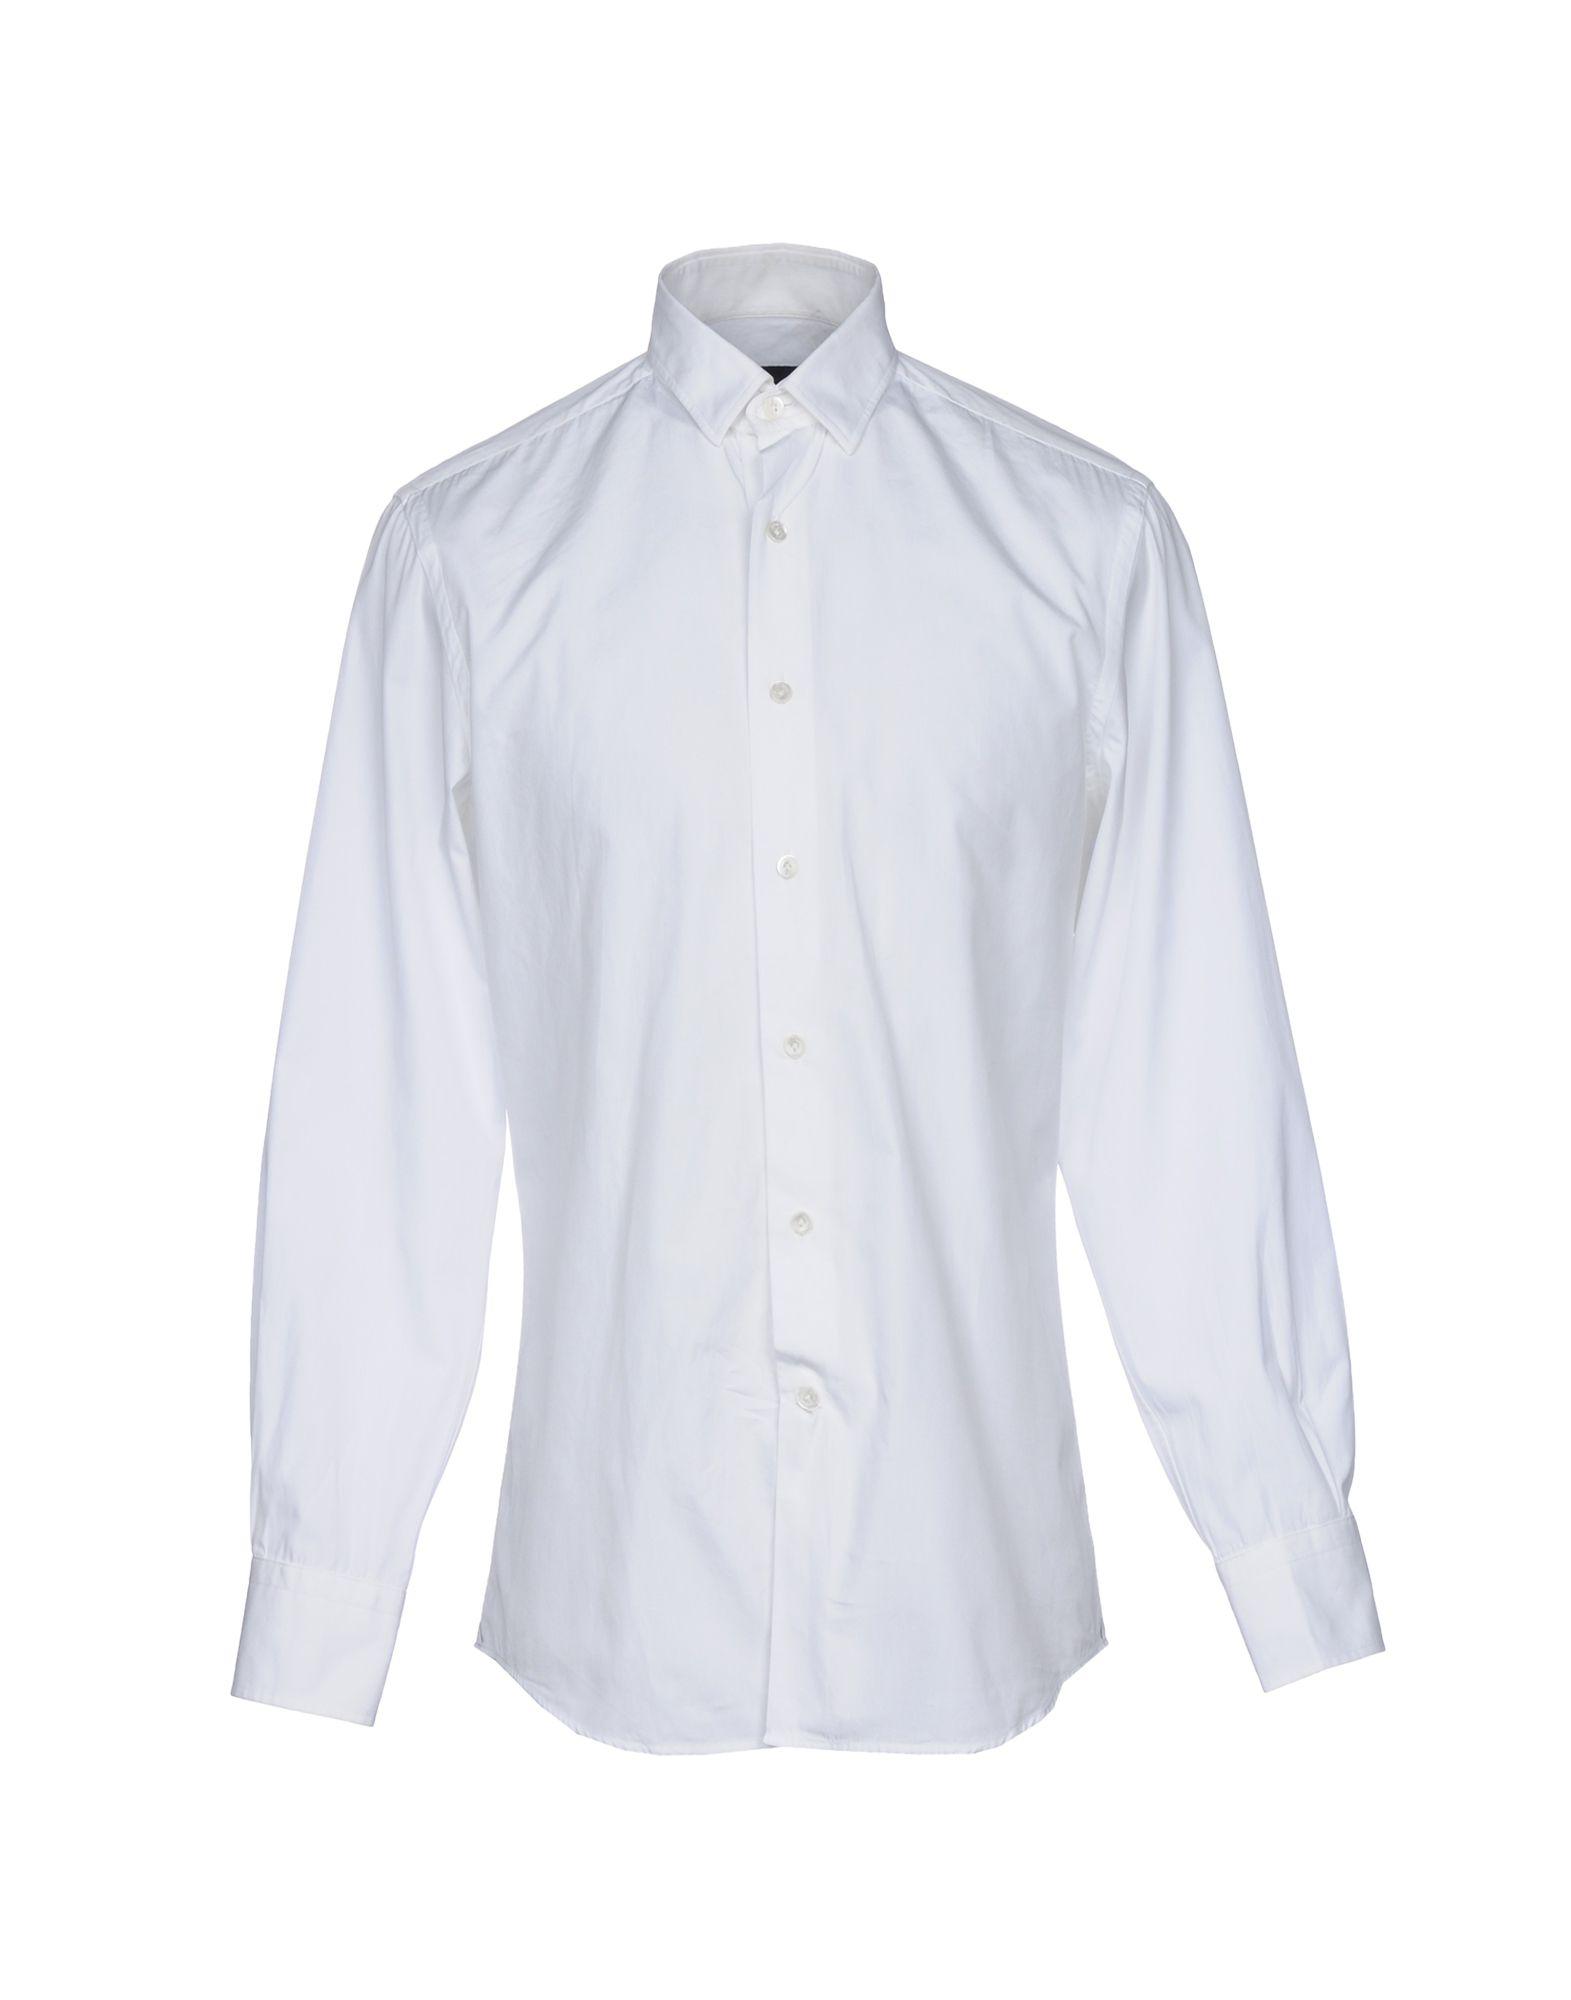 Camicia Tinta Unita Lanvin Uomo - Acquista online su